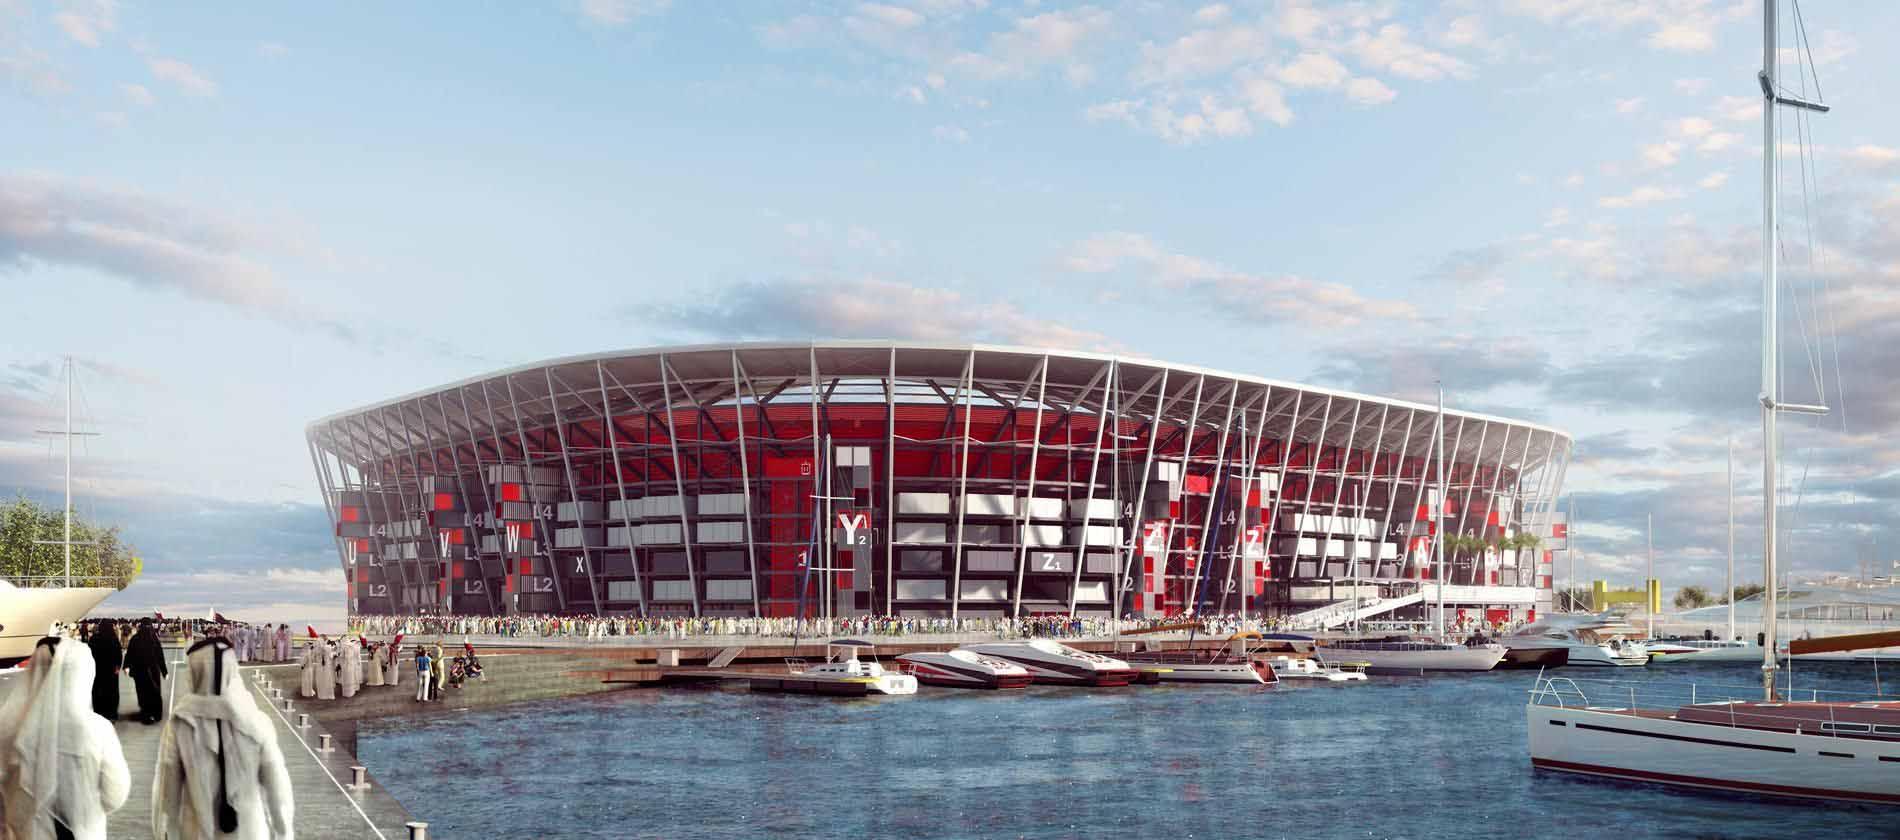 Ras-Abu-Aboud-Stadium-6-1020x610